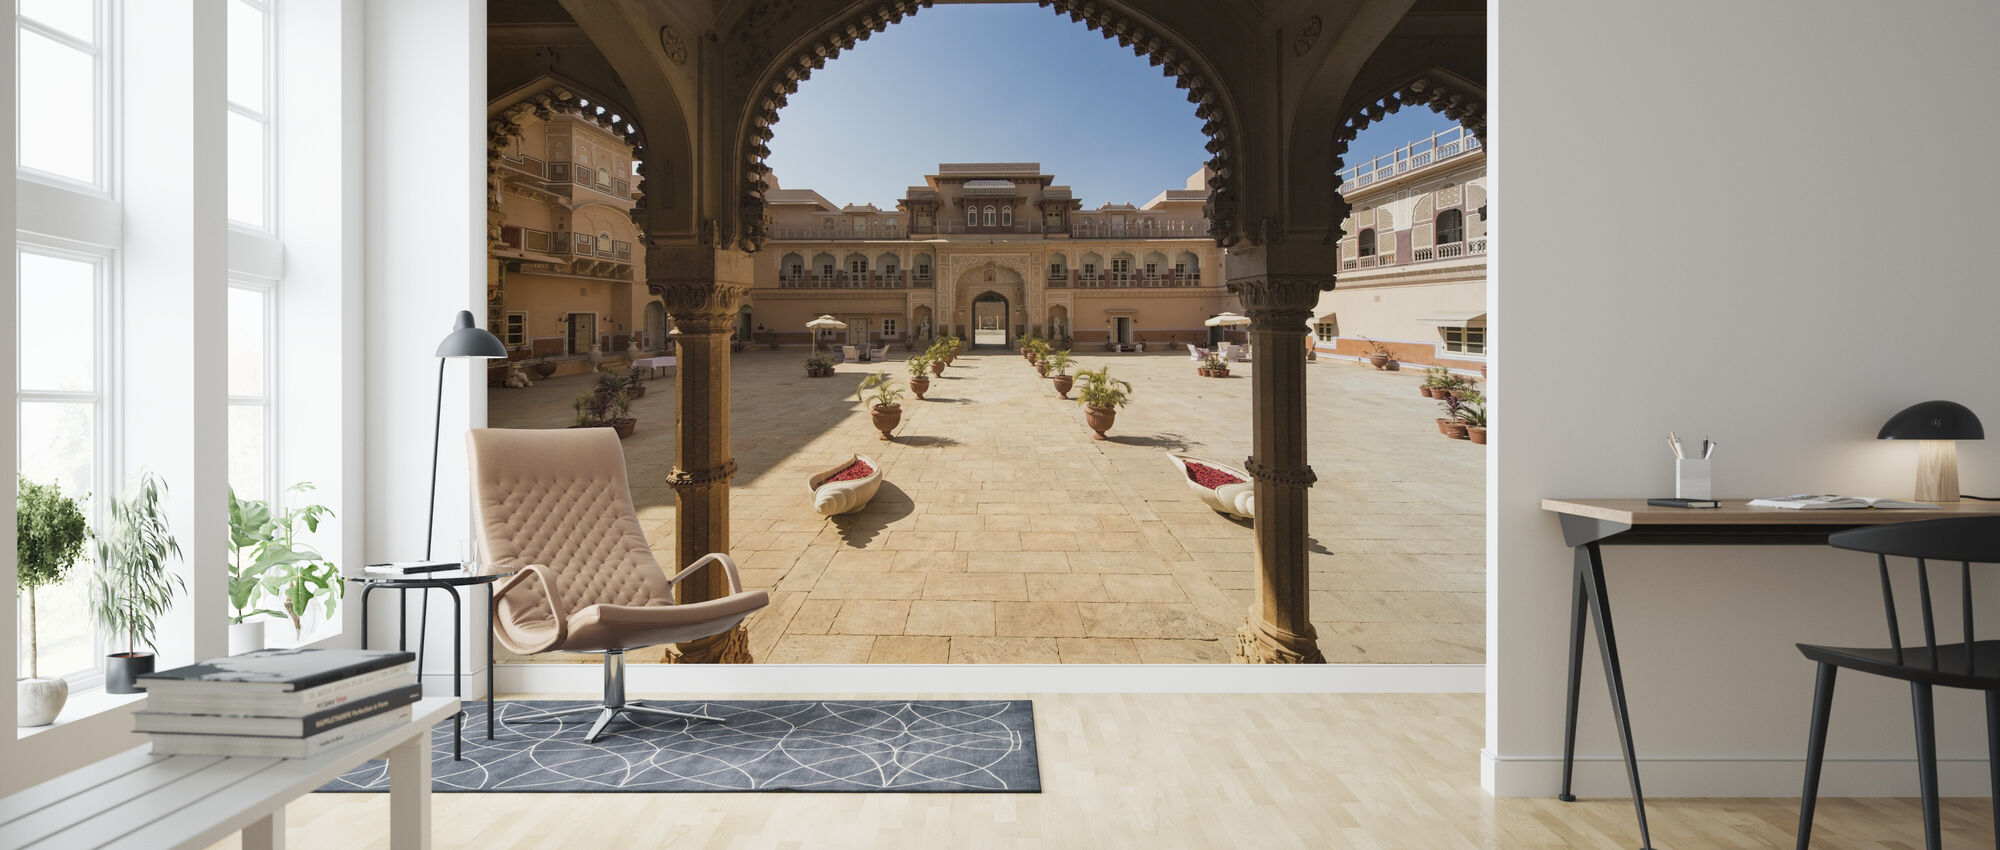 Palace Entrance - Wallpaper - Living Room